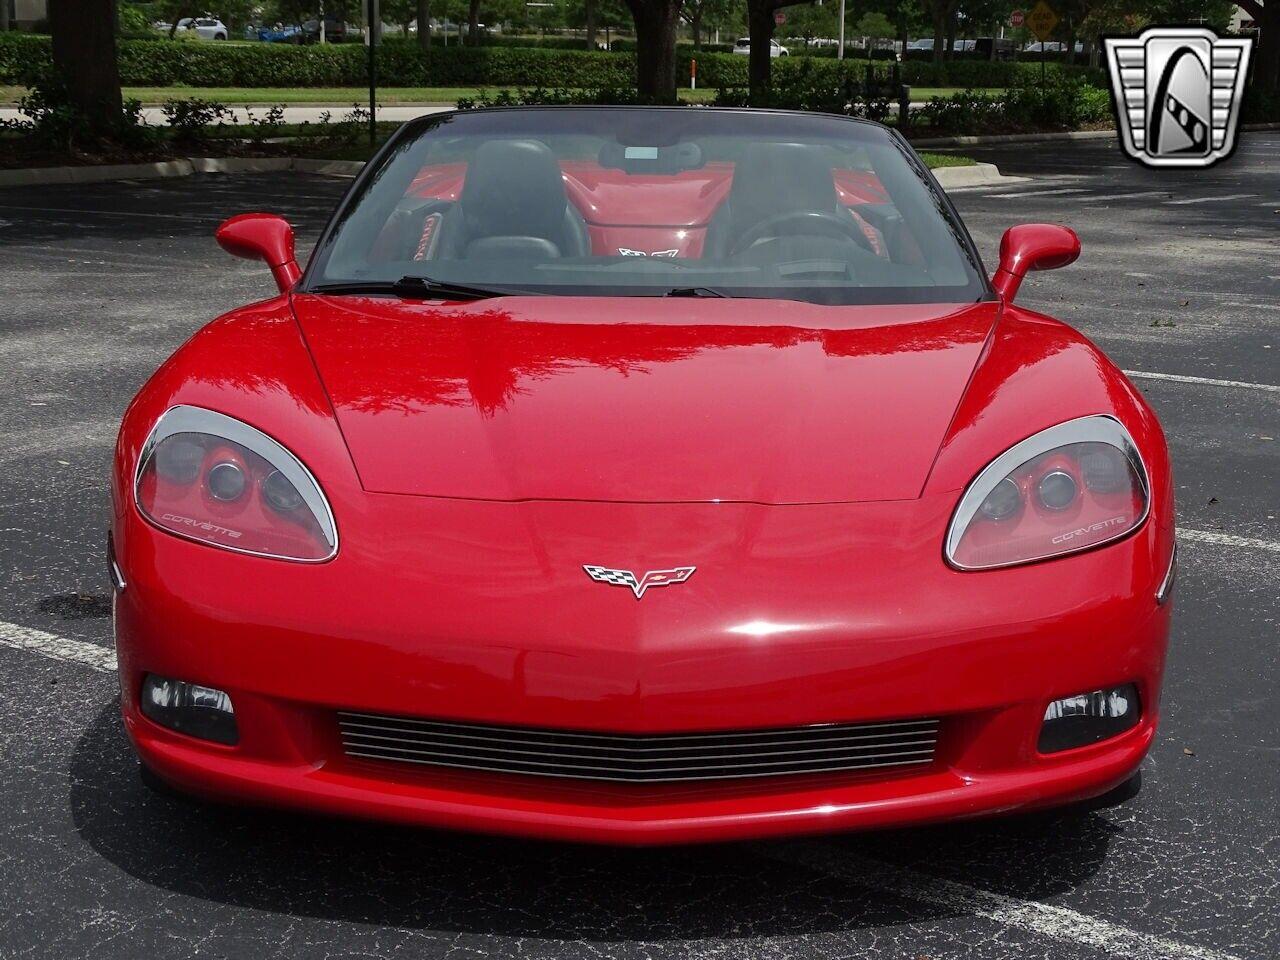 2006 Red Chevrolet Corvette     C6 Corvette Photo 3